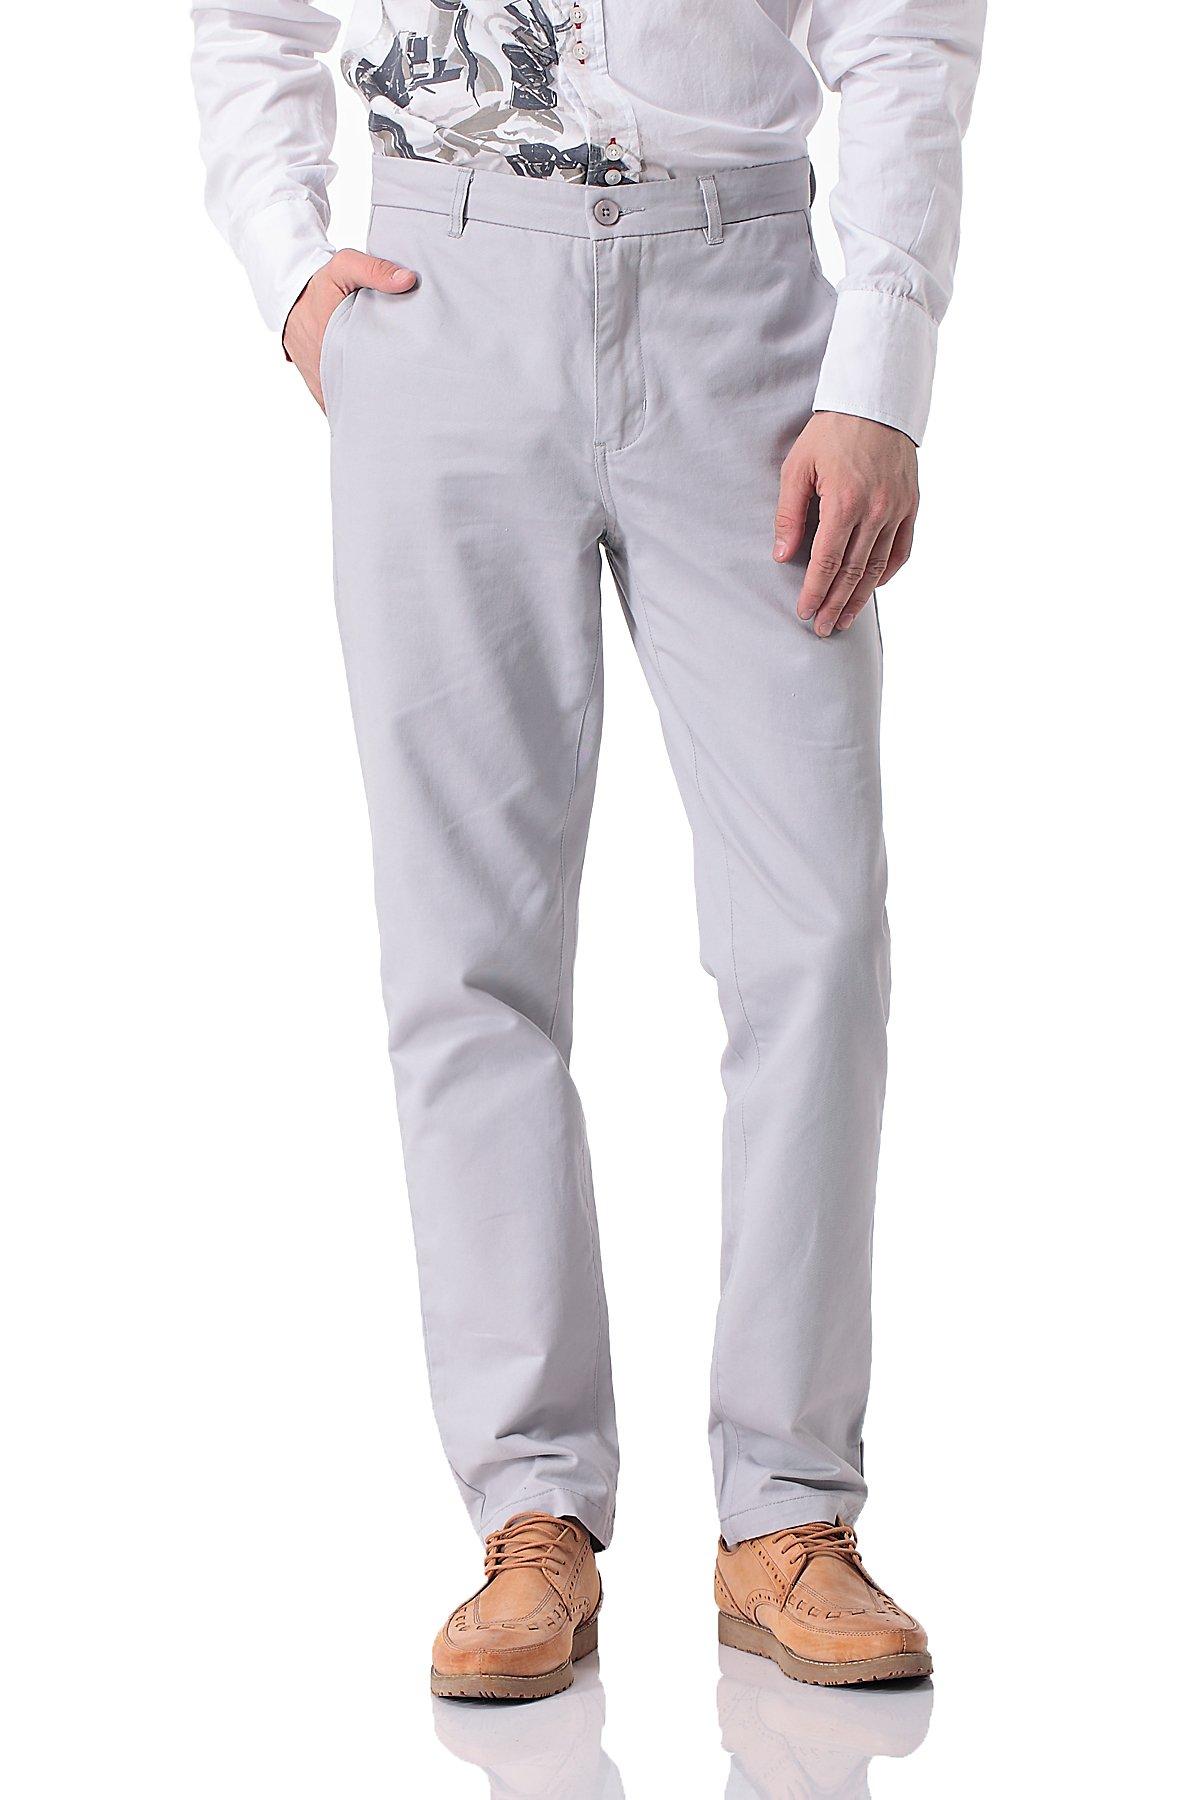 Pau1Hami1ton Men's Casual Straight Leg Chino Khaki Pants PH-14(36,White)